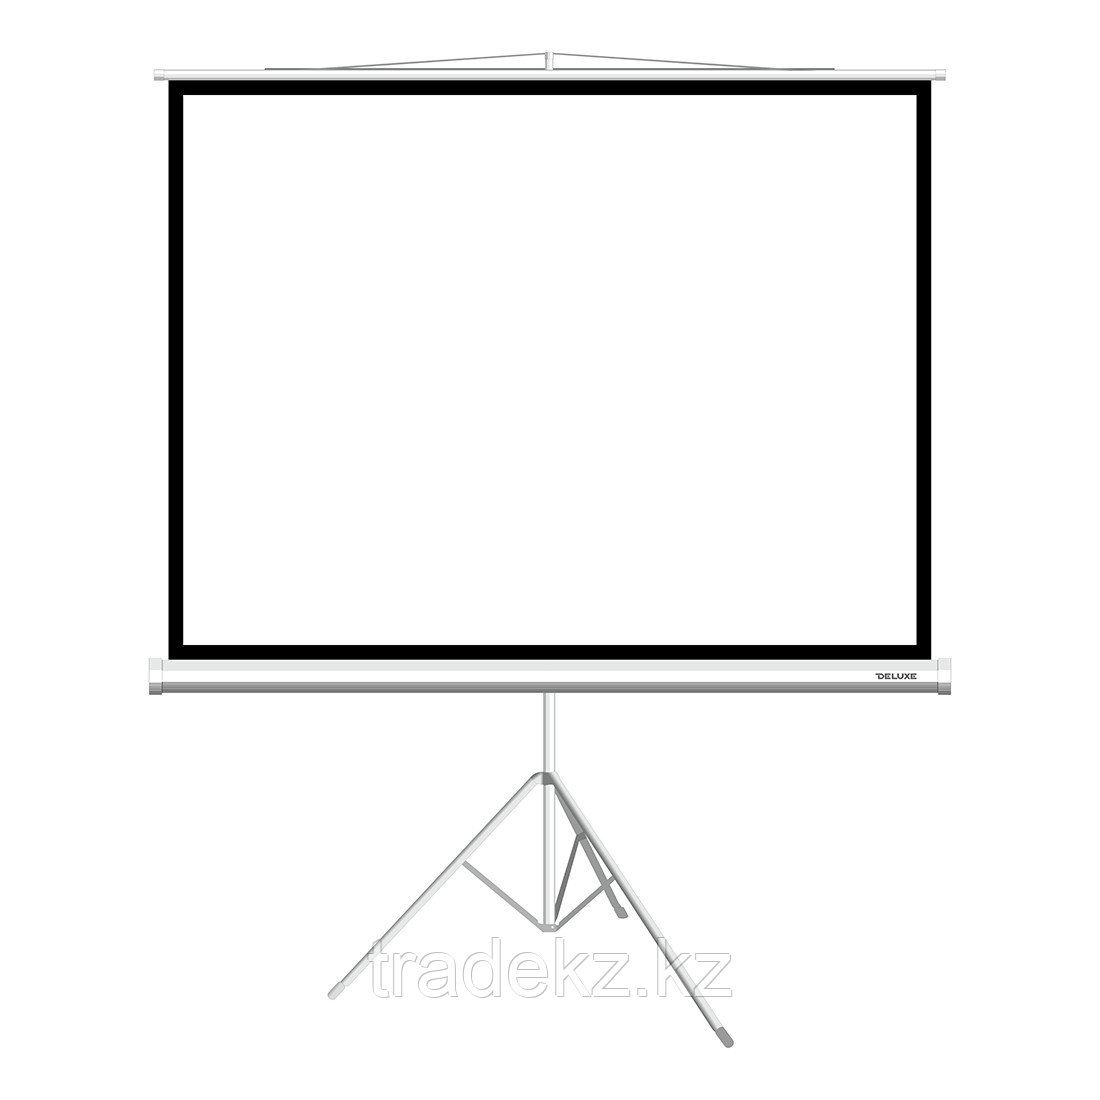 Экран для проекторов Deluxe DLS-T153x116W